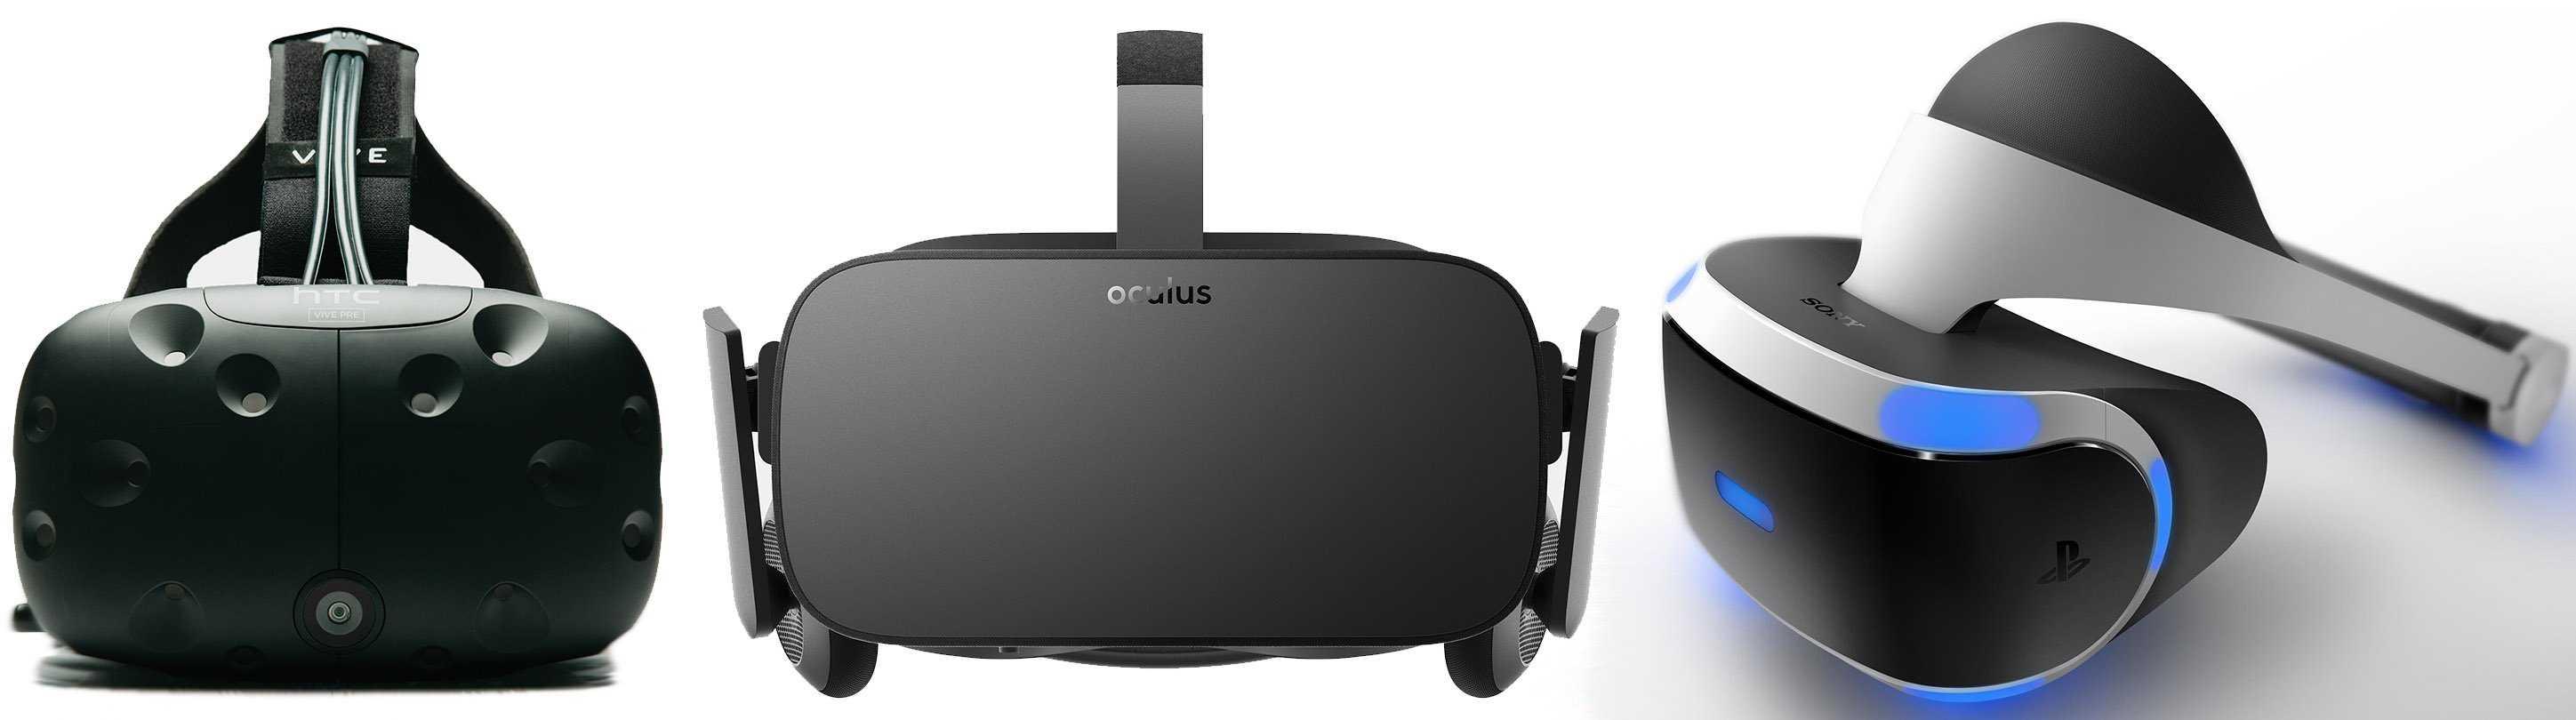 PlayStation VR vs  HTC Vive VR vs  Oculus Rift: Where do you